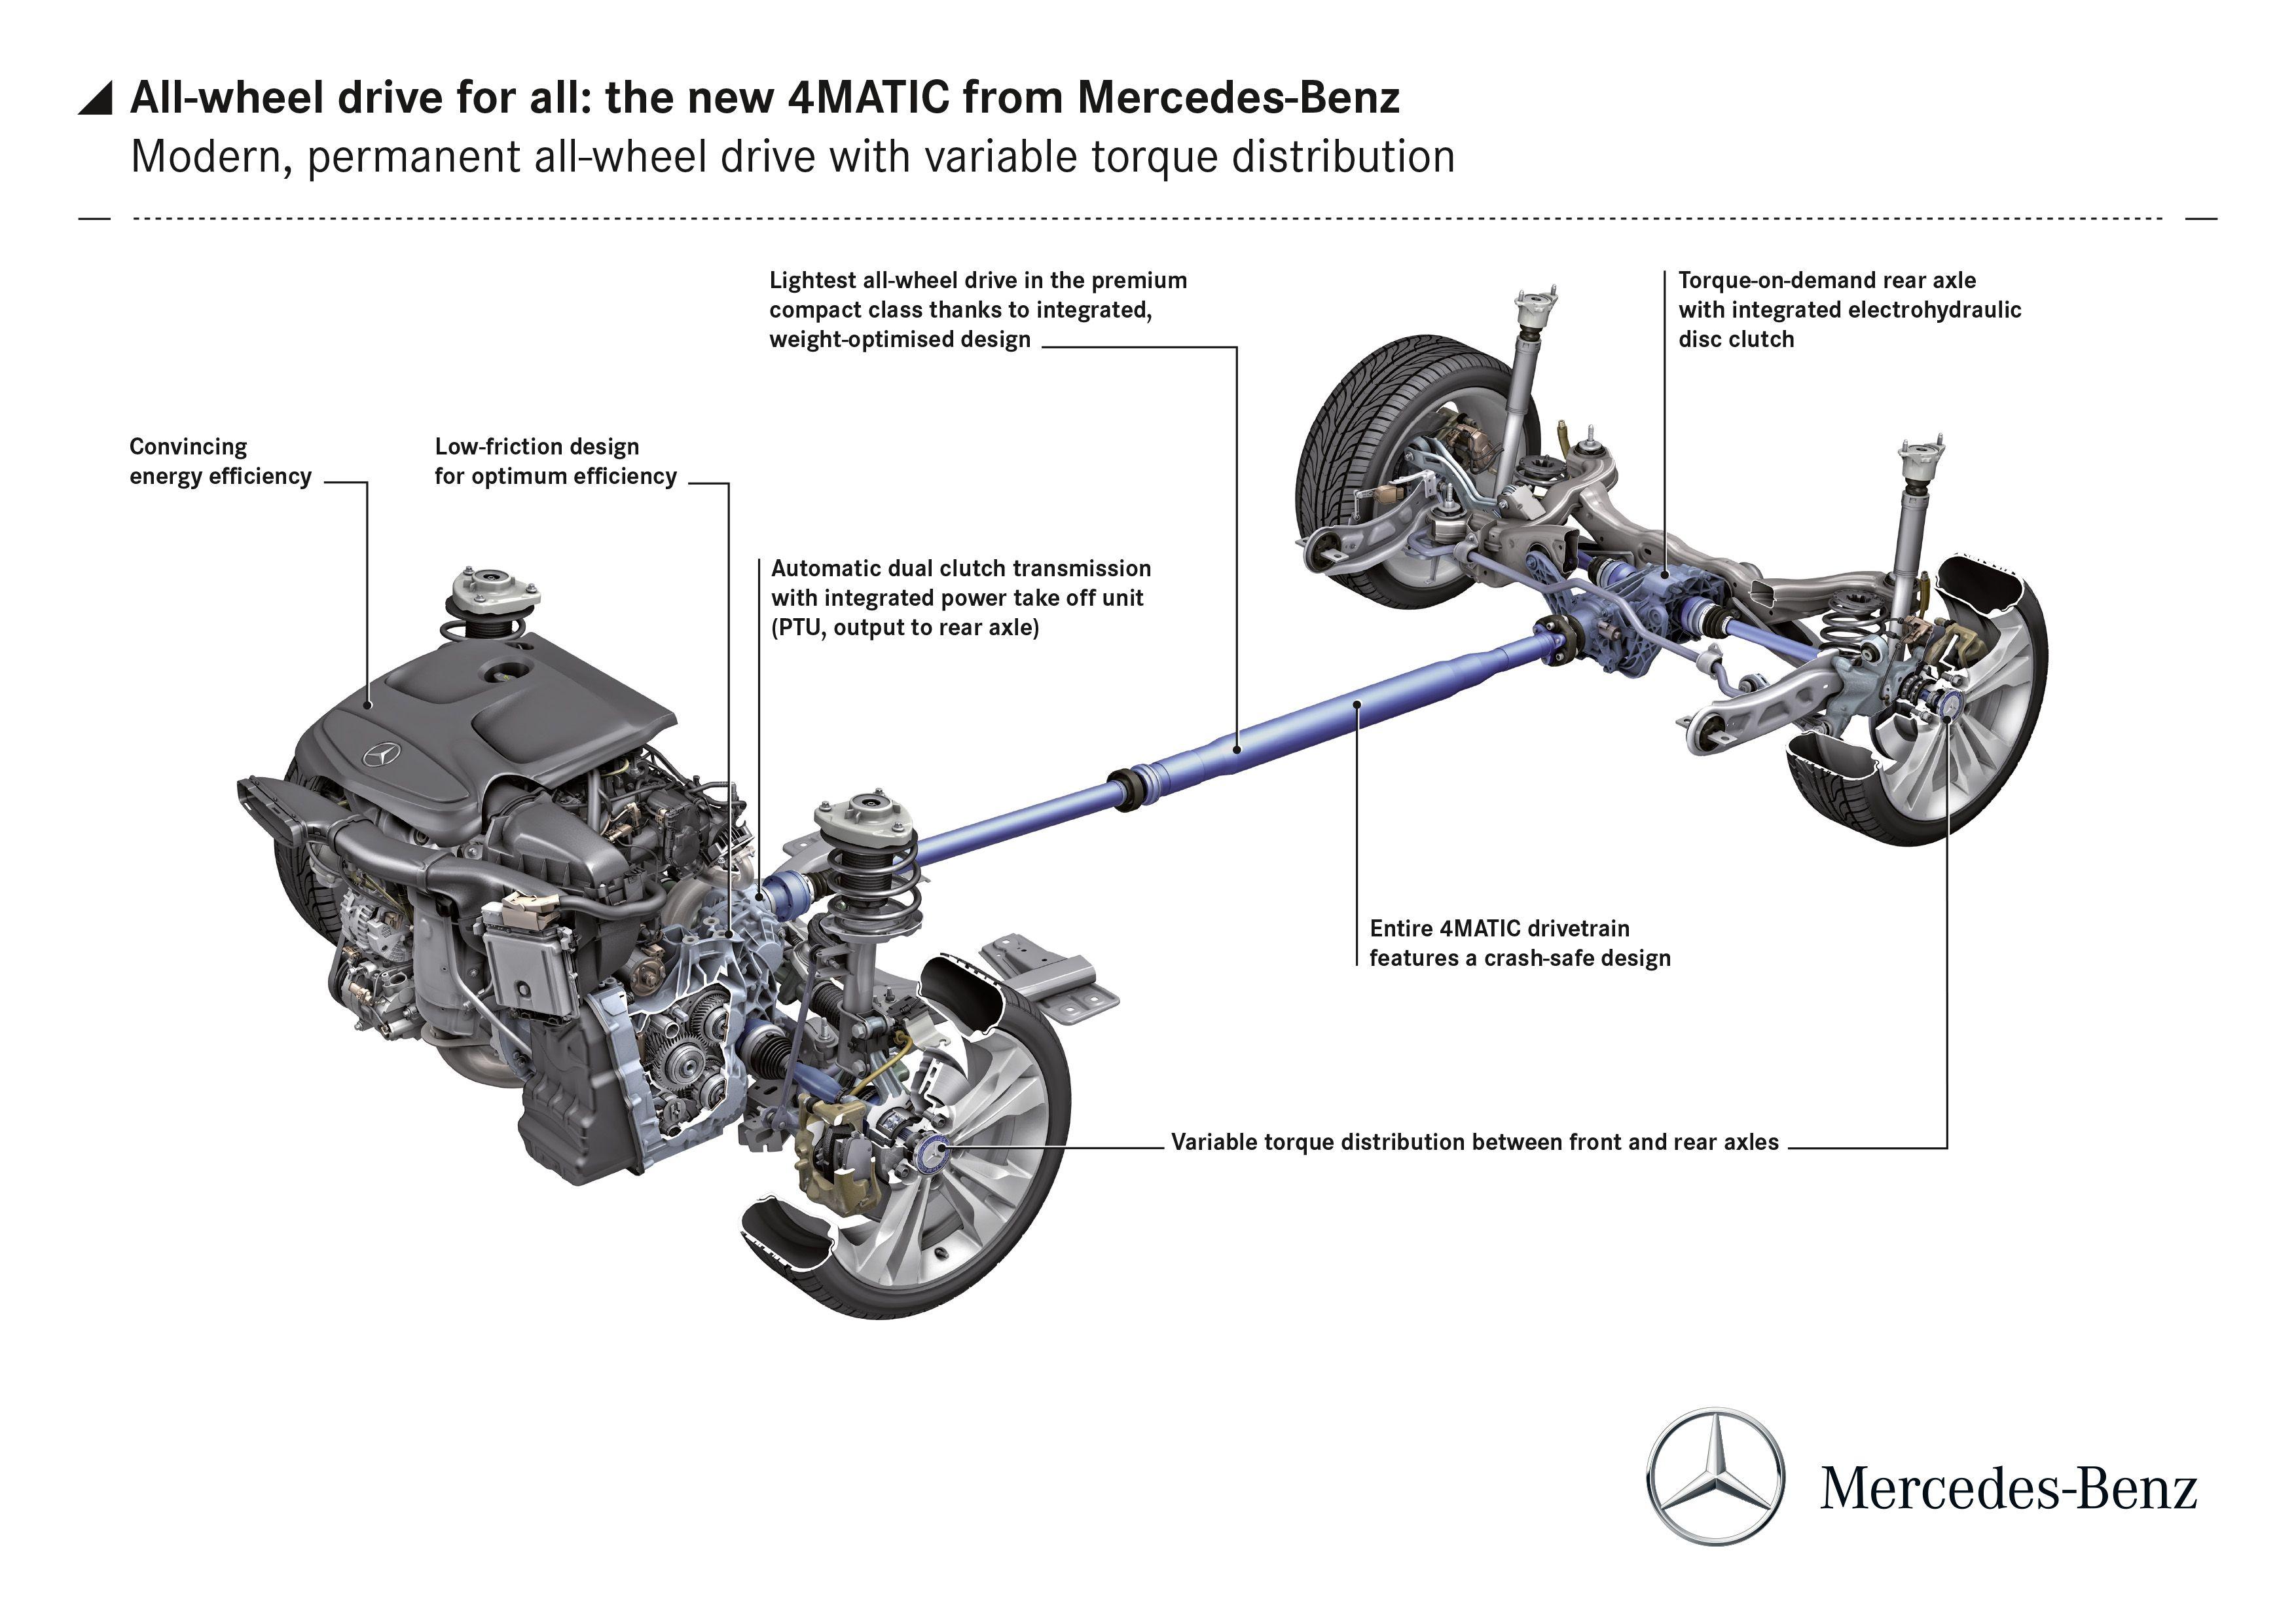 Mercedes-Benz 4 wheel drive cars | -♥ Autos ♥- | Pinterest ...